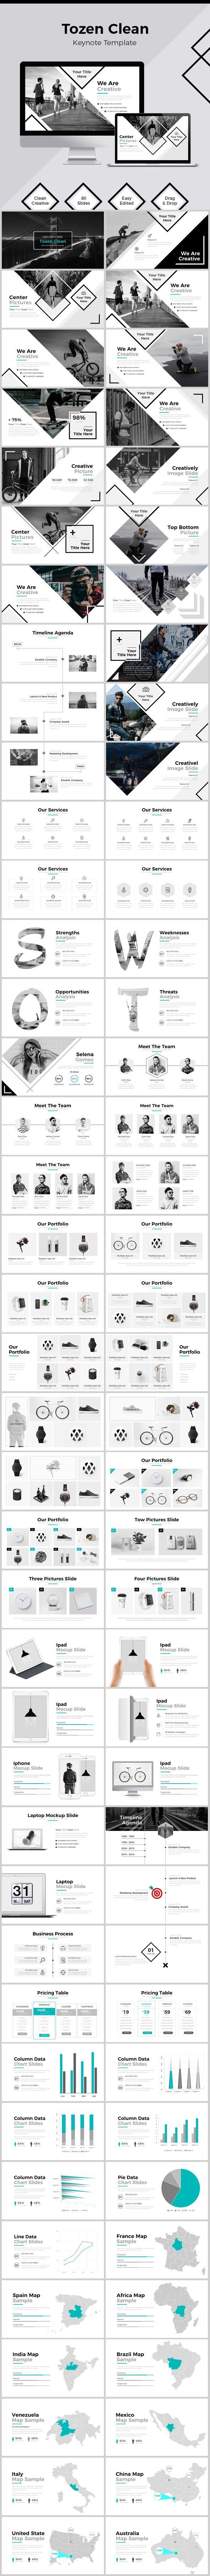 244 best @pt & design guide images on pinterest | style guides, ui, Presentation templates